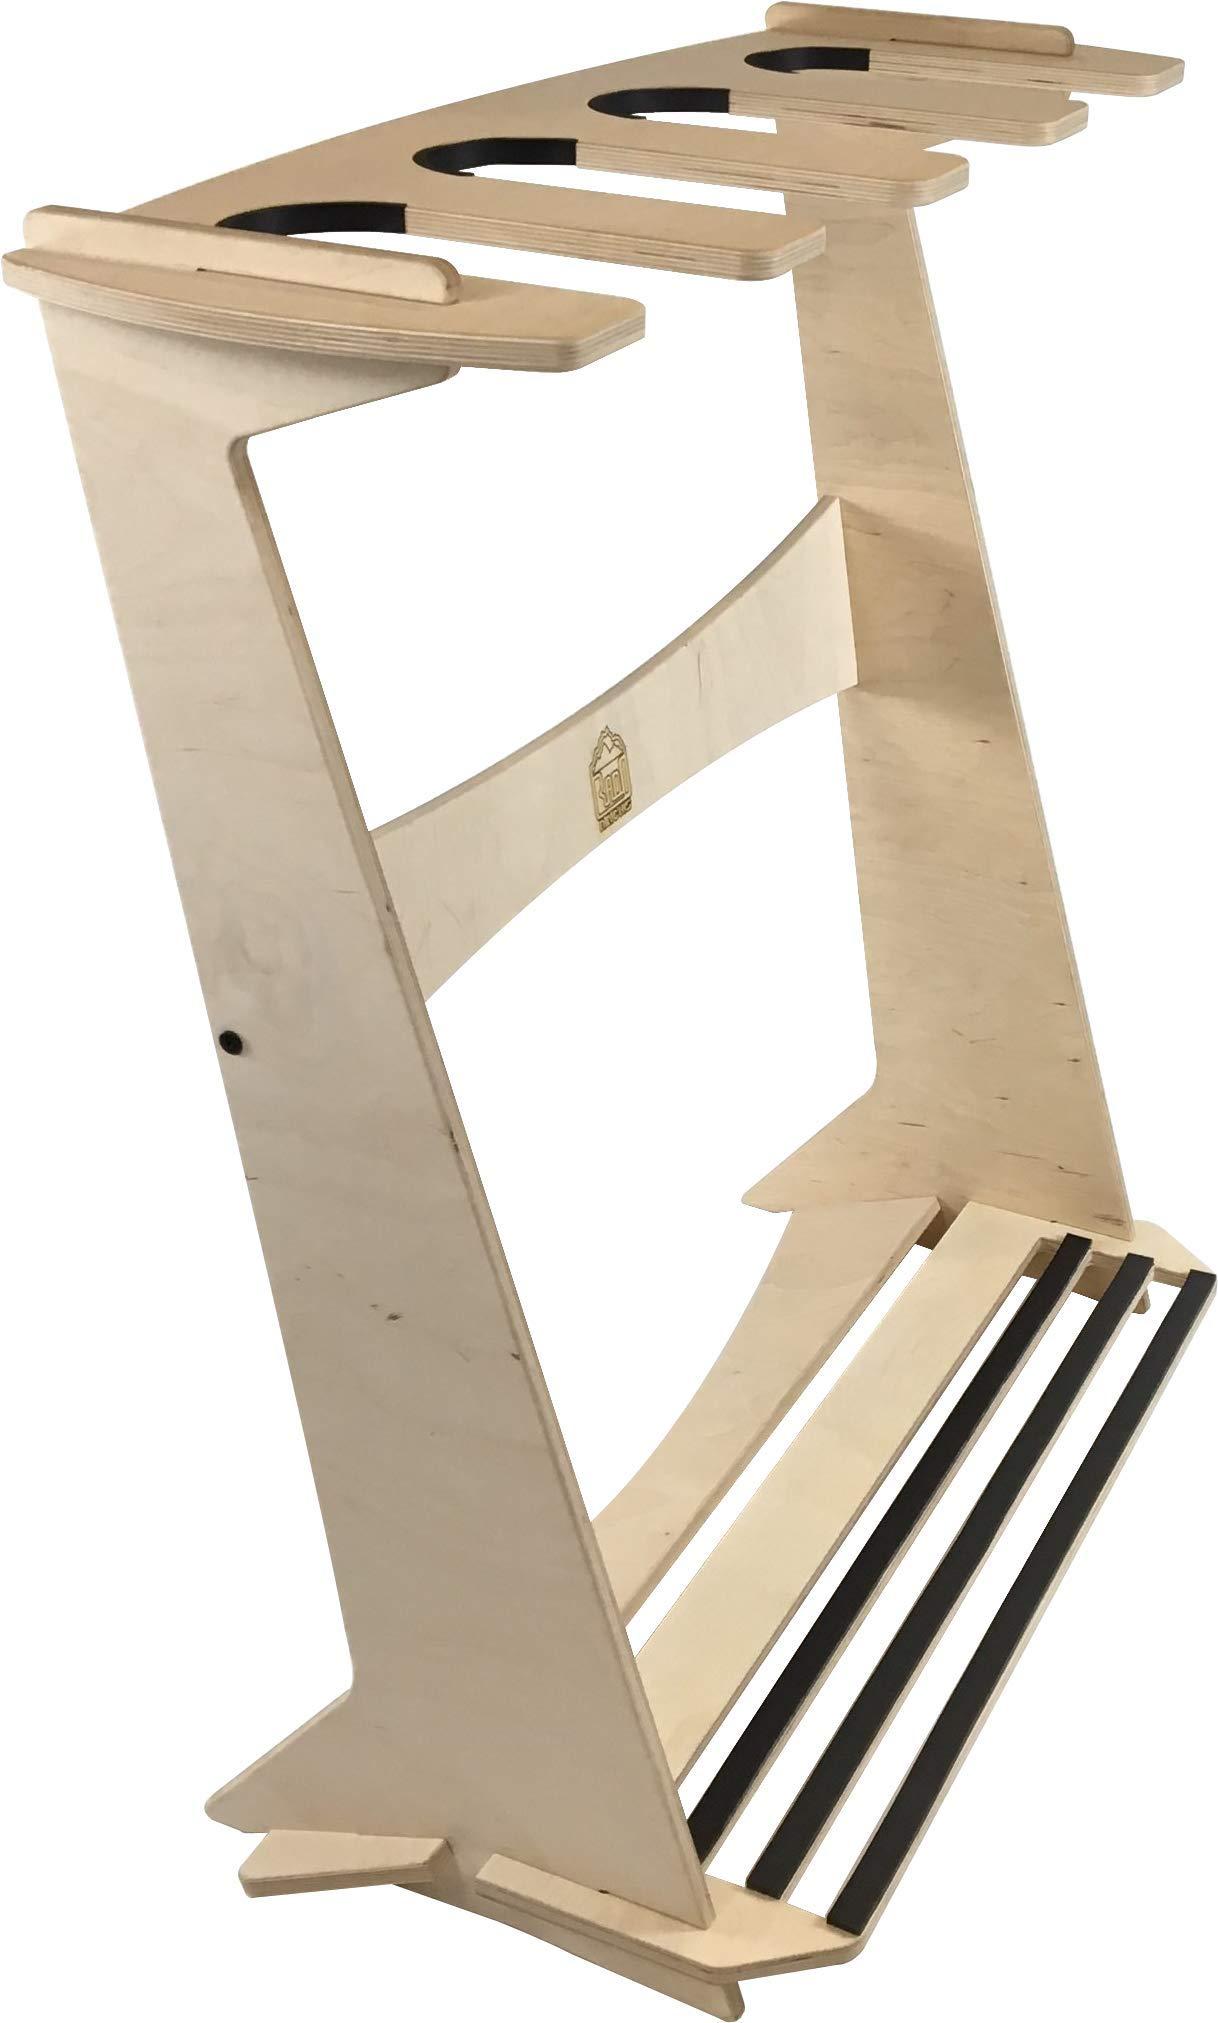 The Pacifica Freestanding Surfboard Display Rack (Holds 4 Boards) by Rado Racks